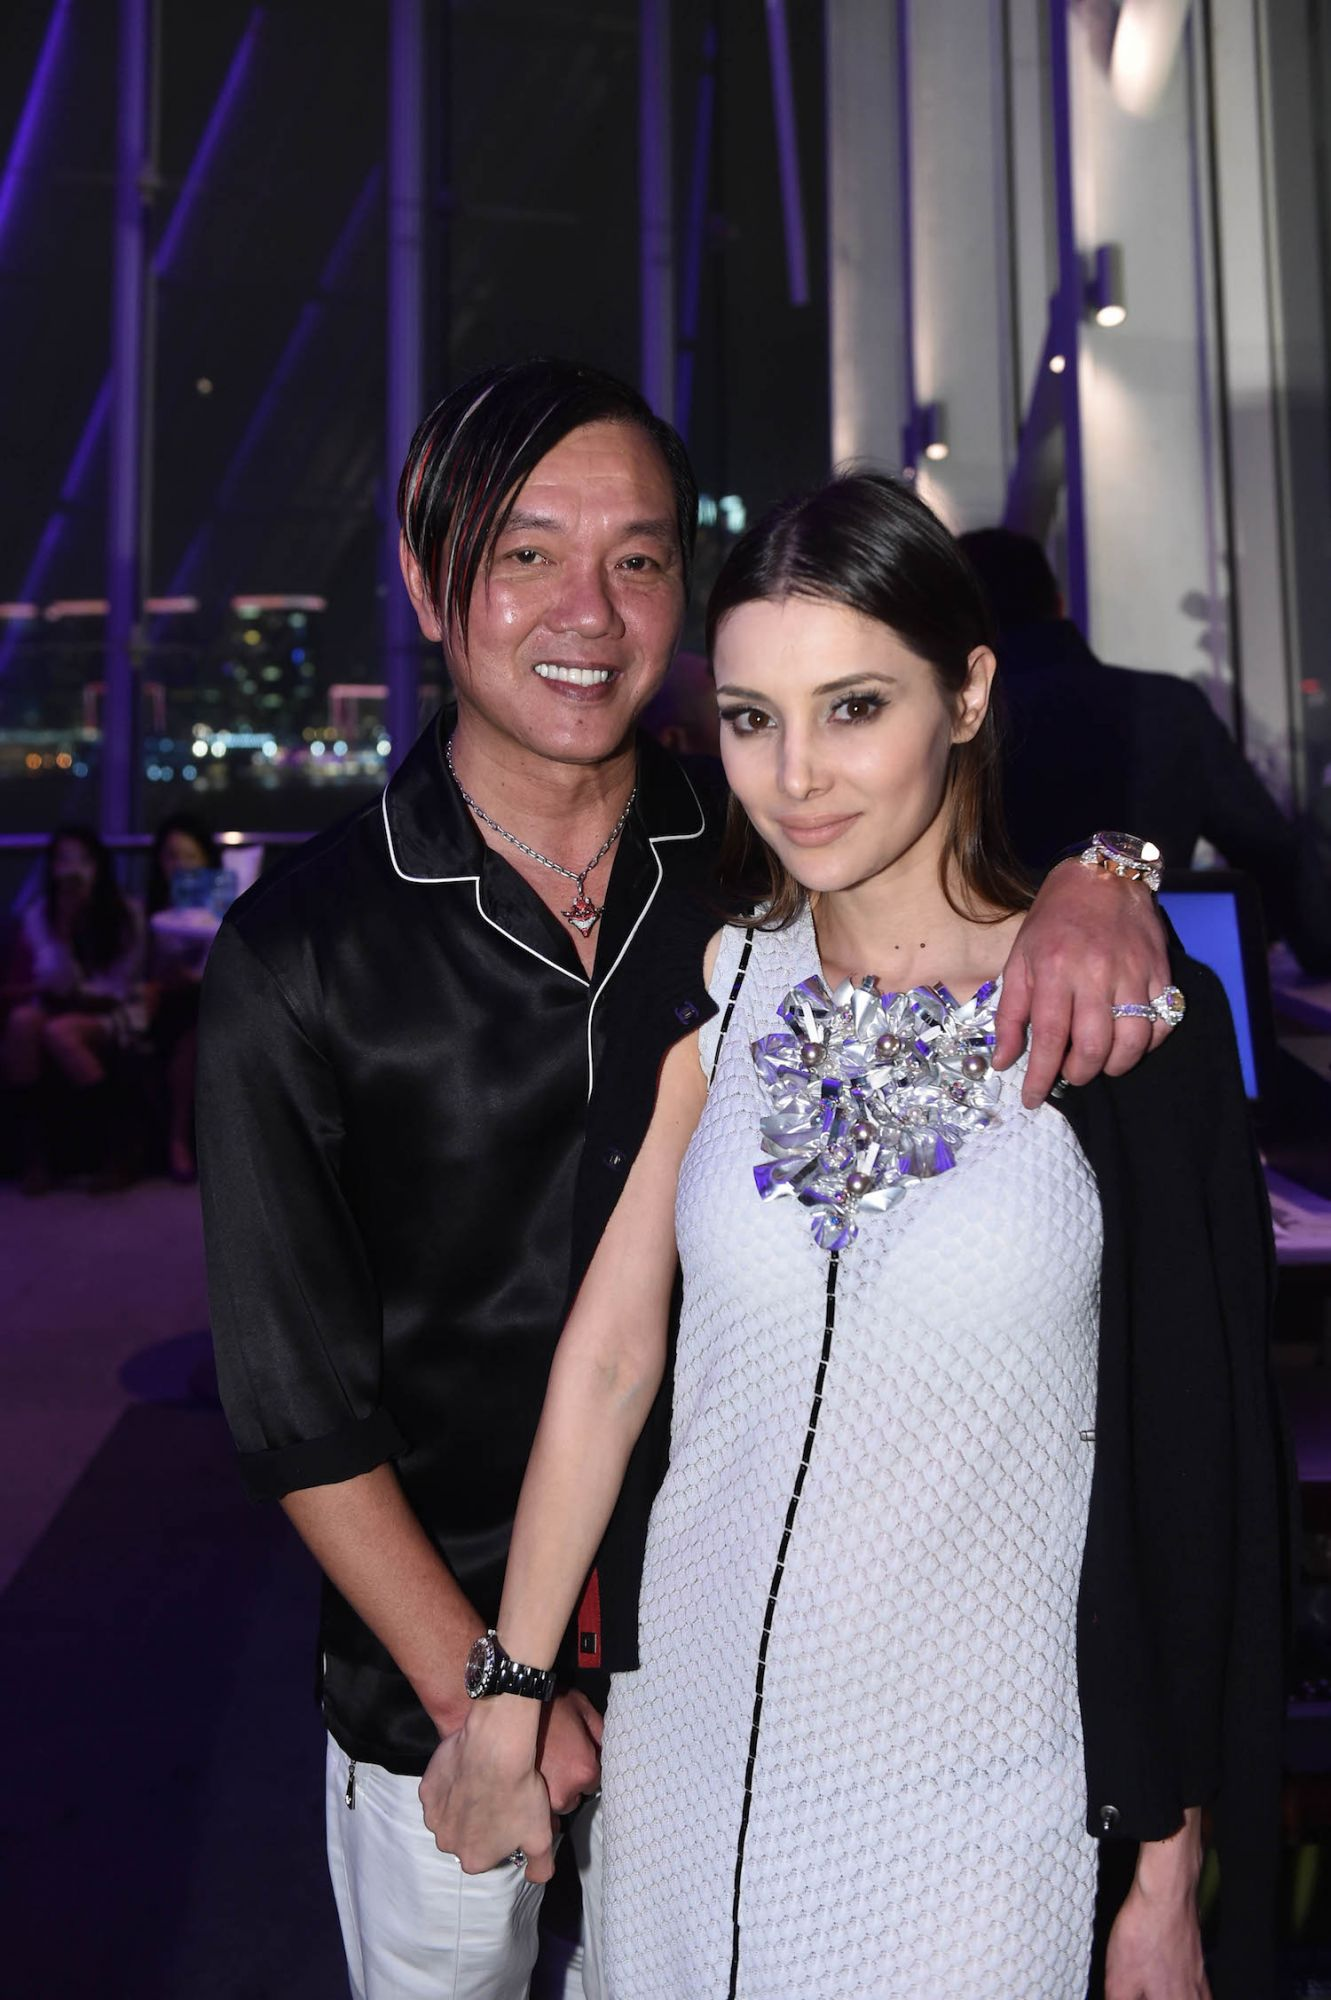 Stephen and Deborah Hung